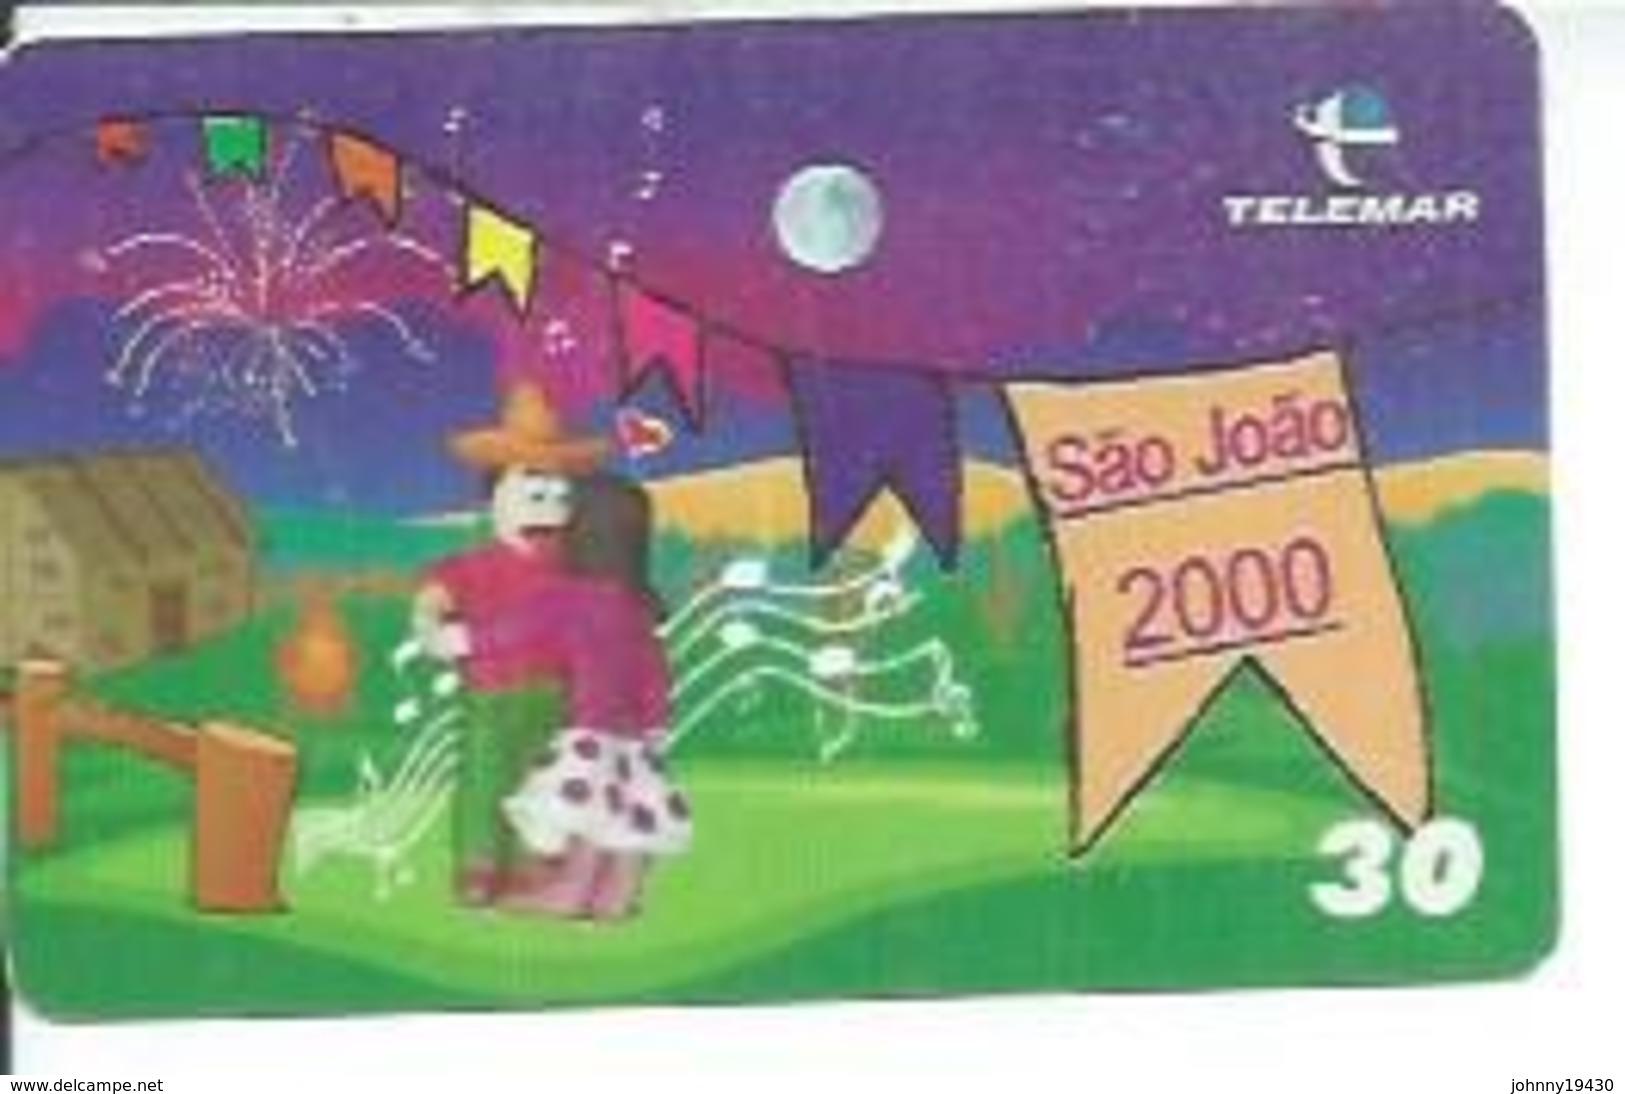 TELEMAR 30 - SÄO JOÄO 2000   - BRESIL 06/2000 - Brésil